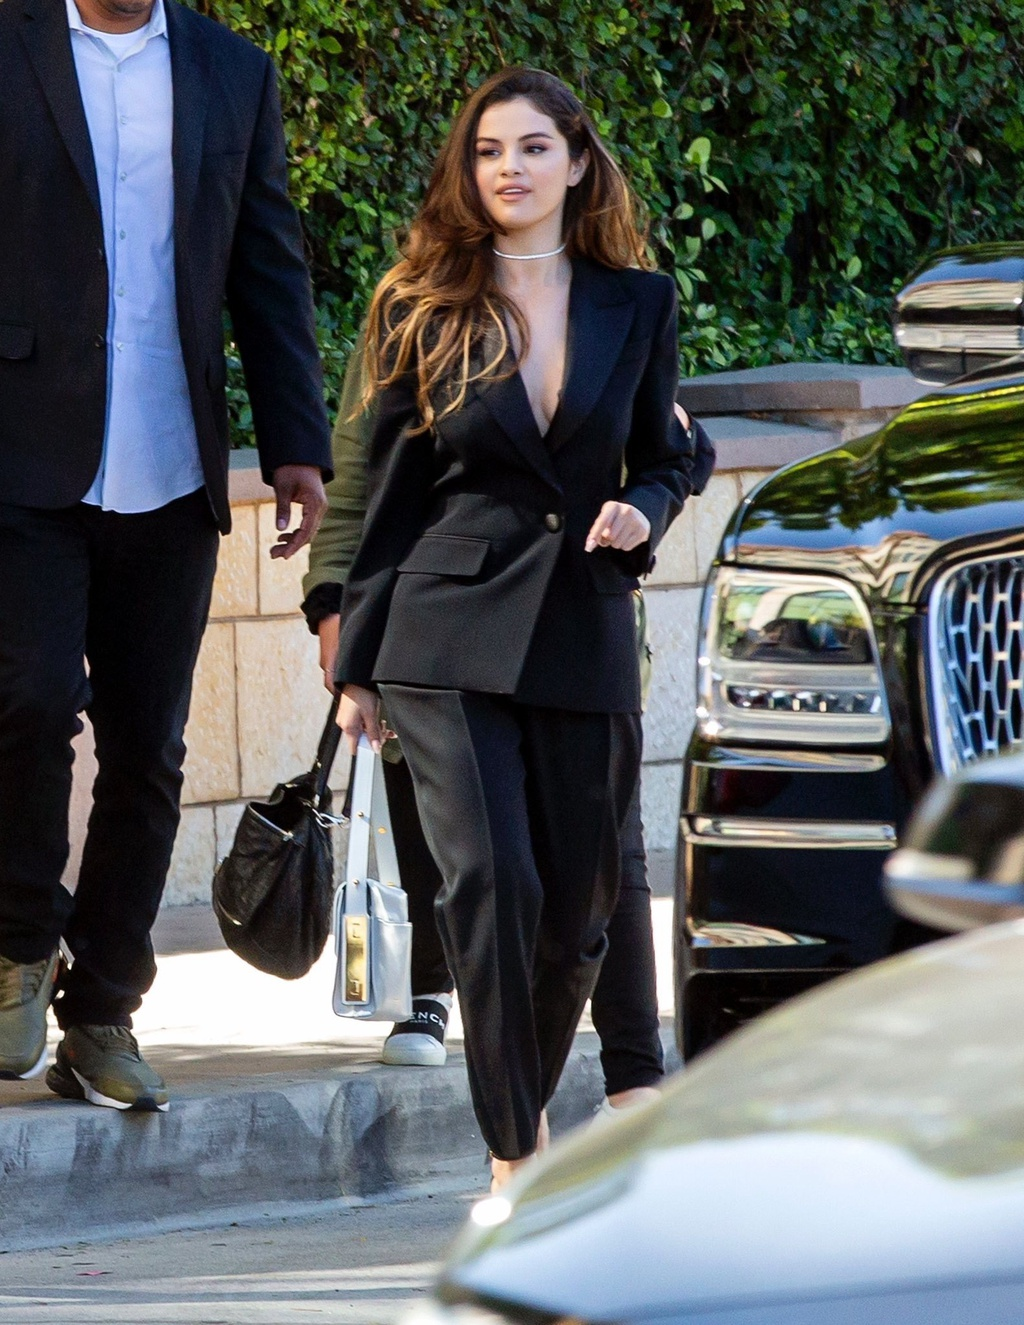 Selena Gomez lay lai nhan sac, voc dang sexy sau khi giam can hinh anh 11